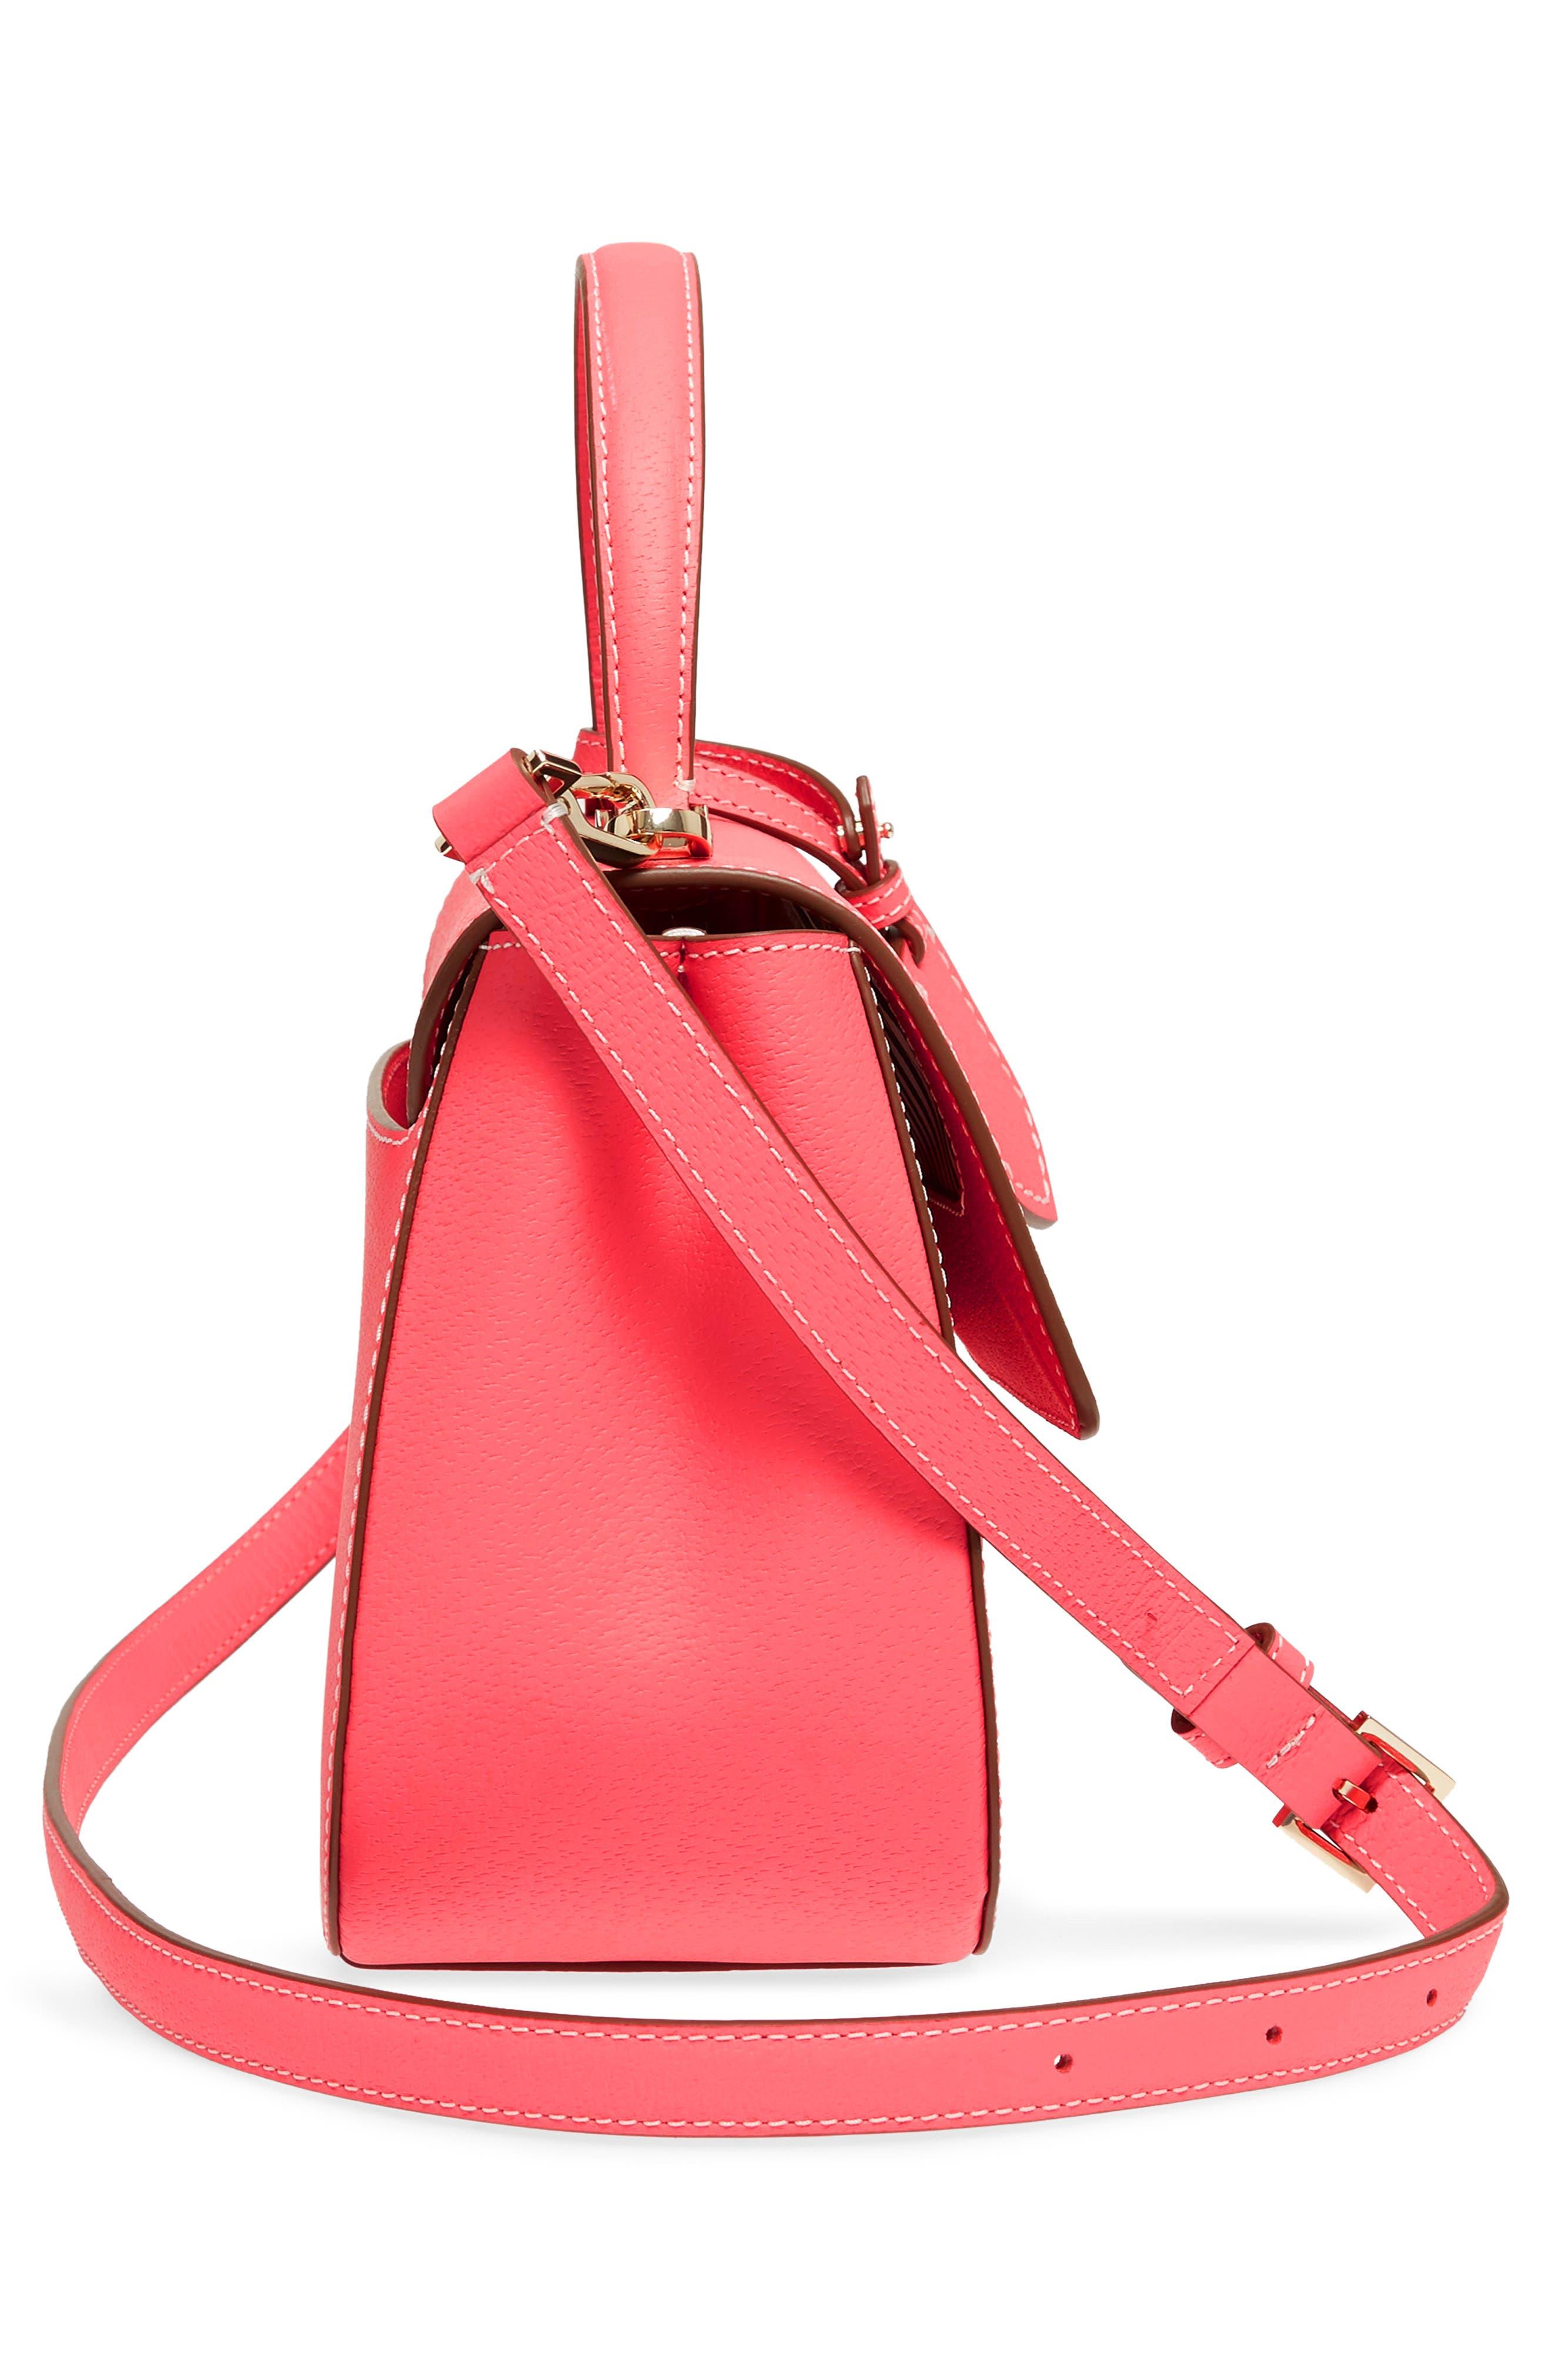 thompson street - justina leather satchel,                             Alternate thumbnail 5, color,                             650